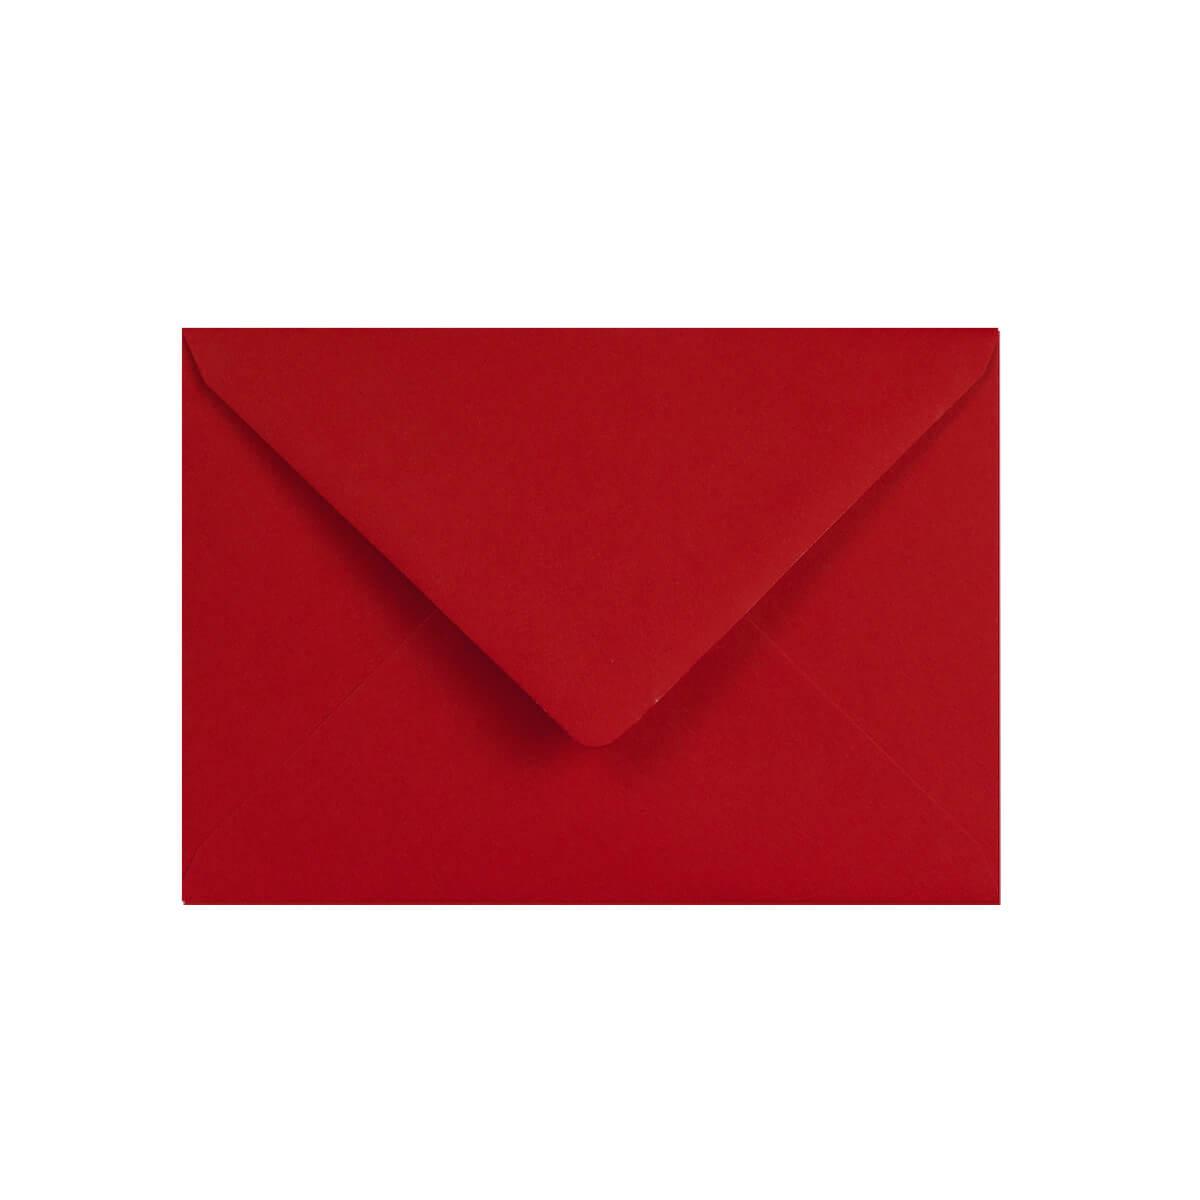 DARK RED 70 x 100mm ENVELOPES 120gsm